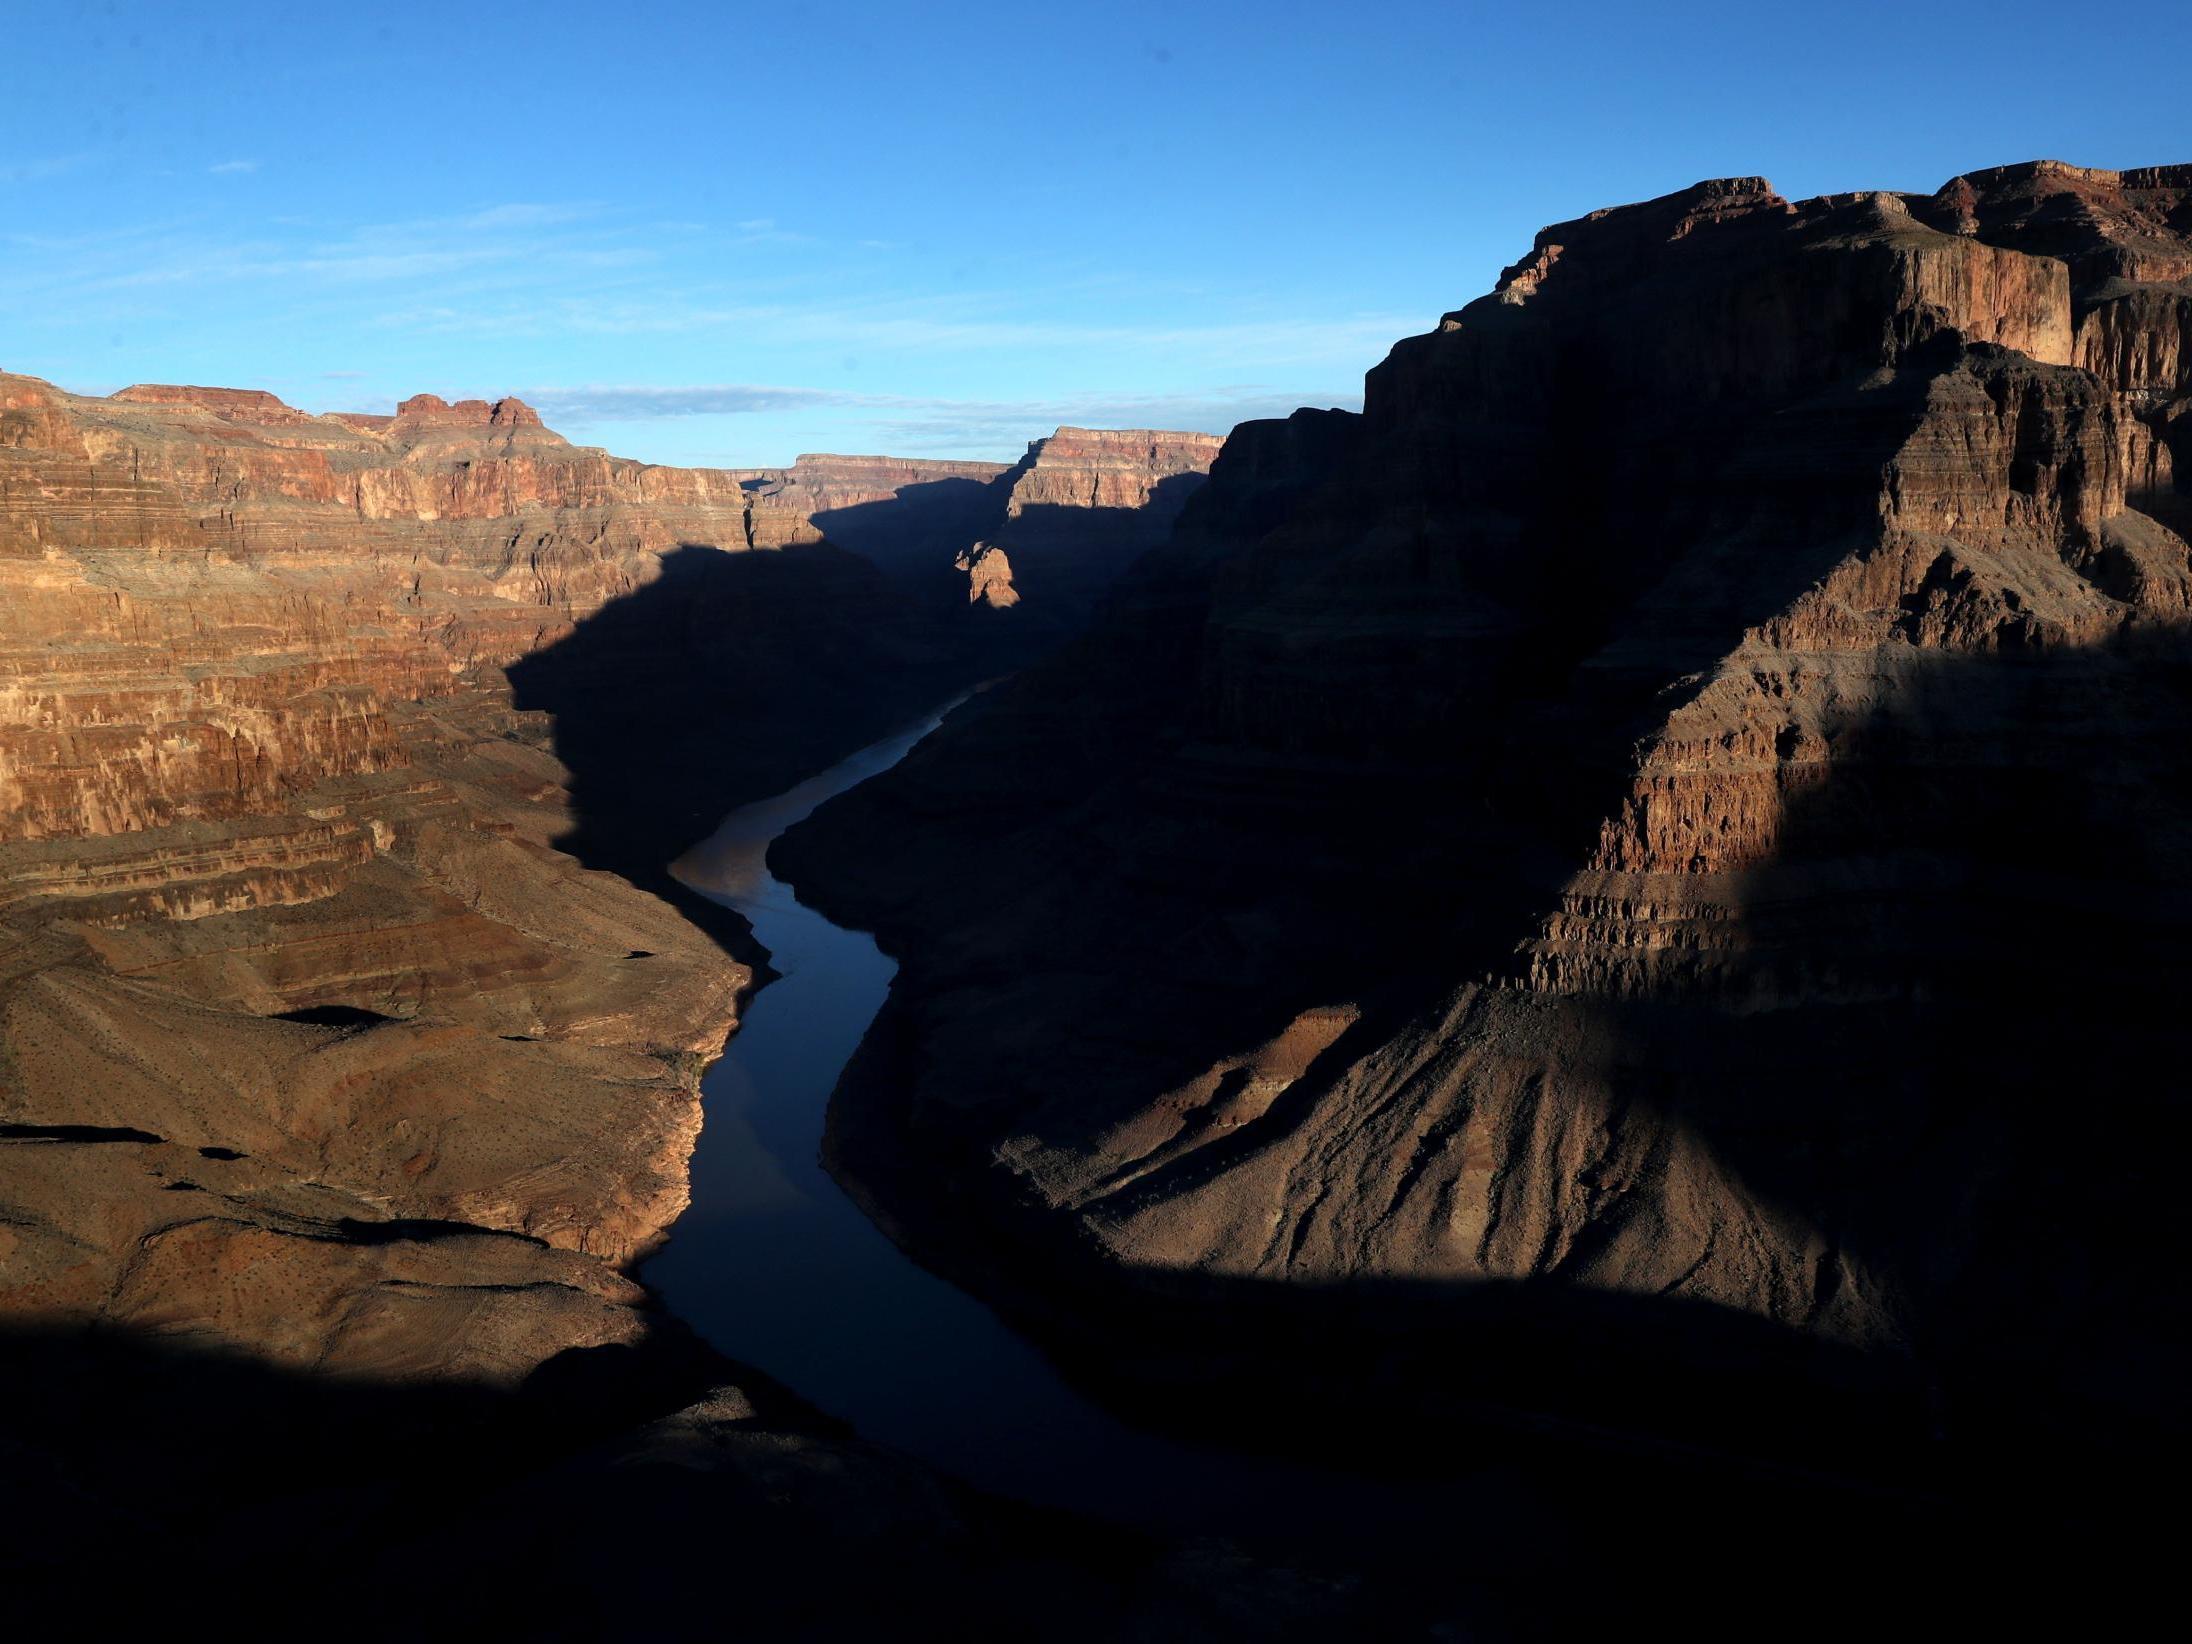 British man dies after Grand Canyon skydive goes wrong